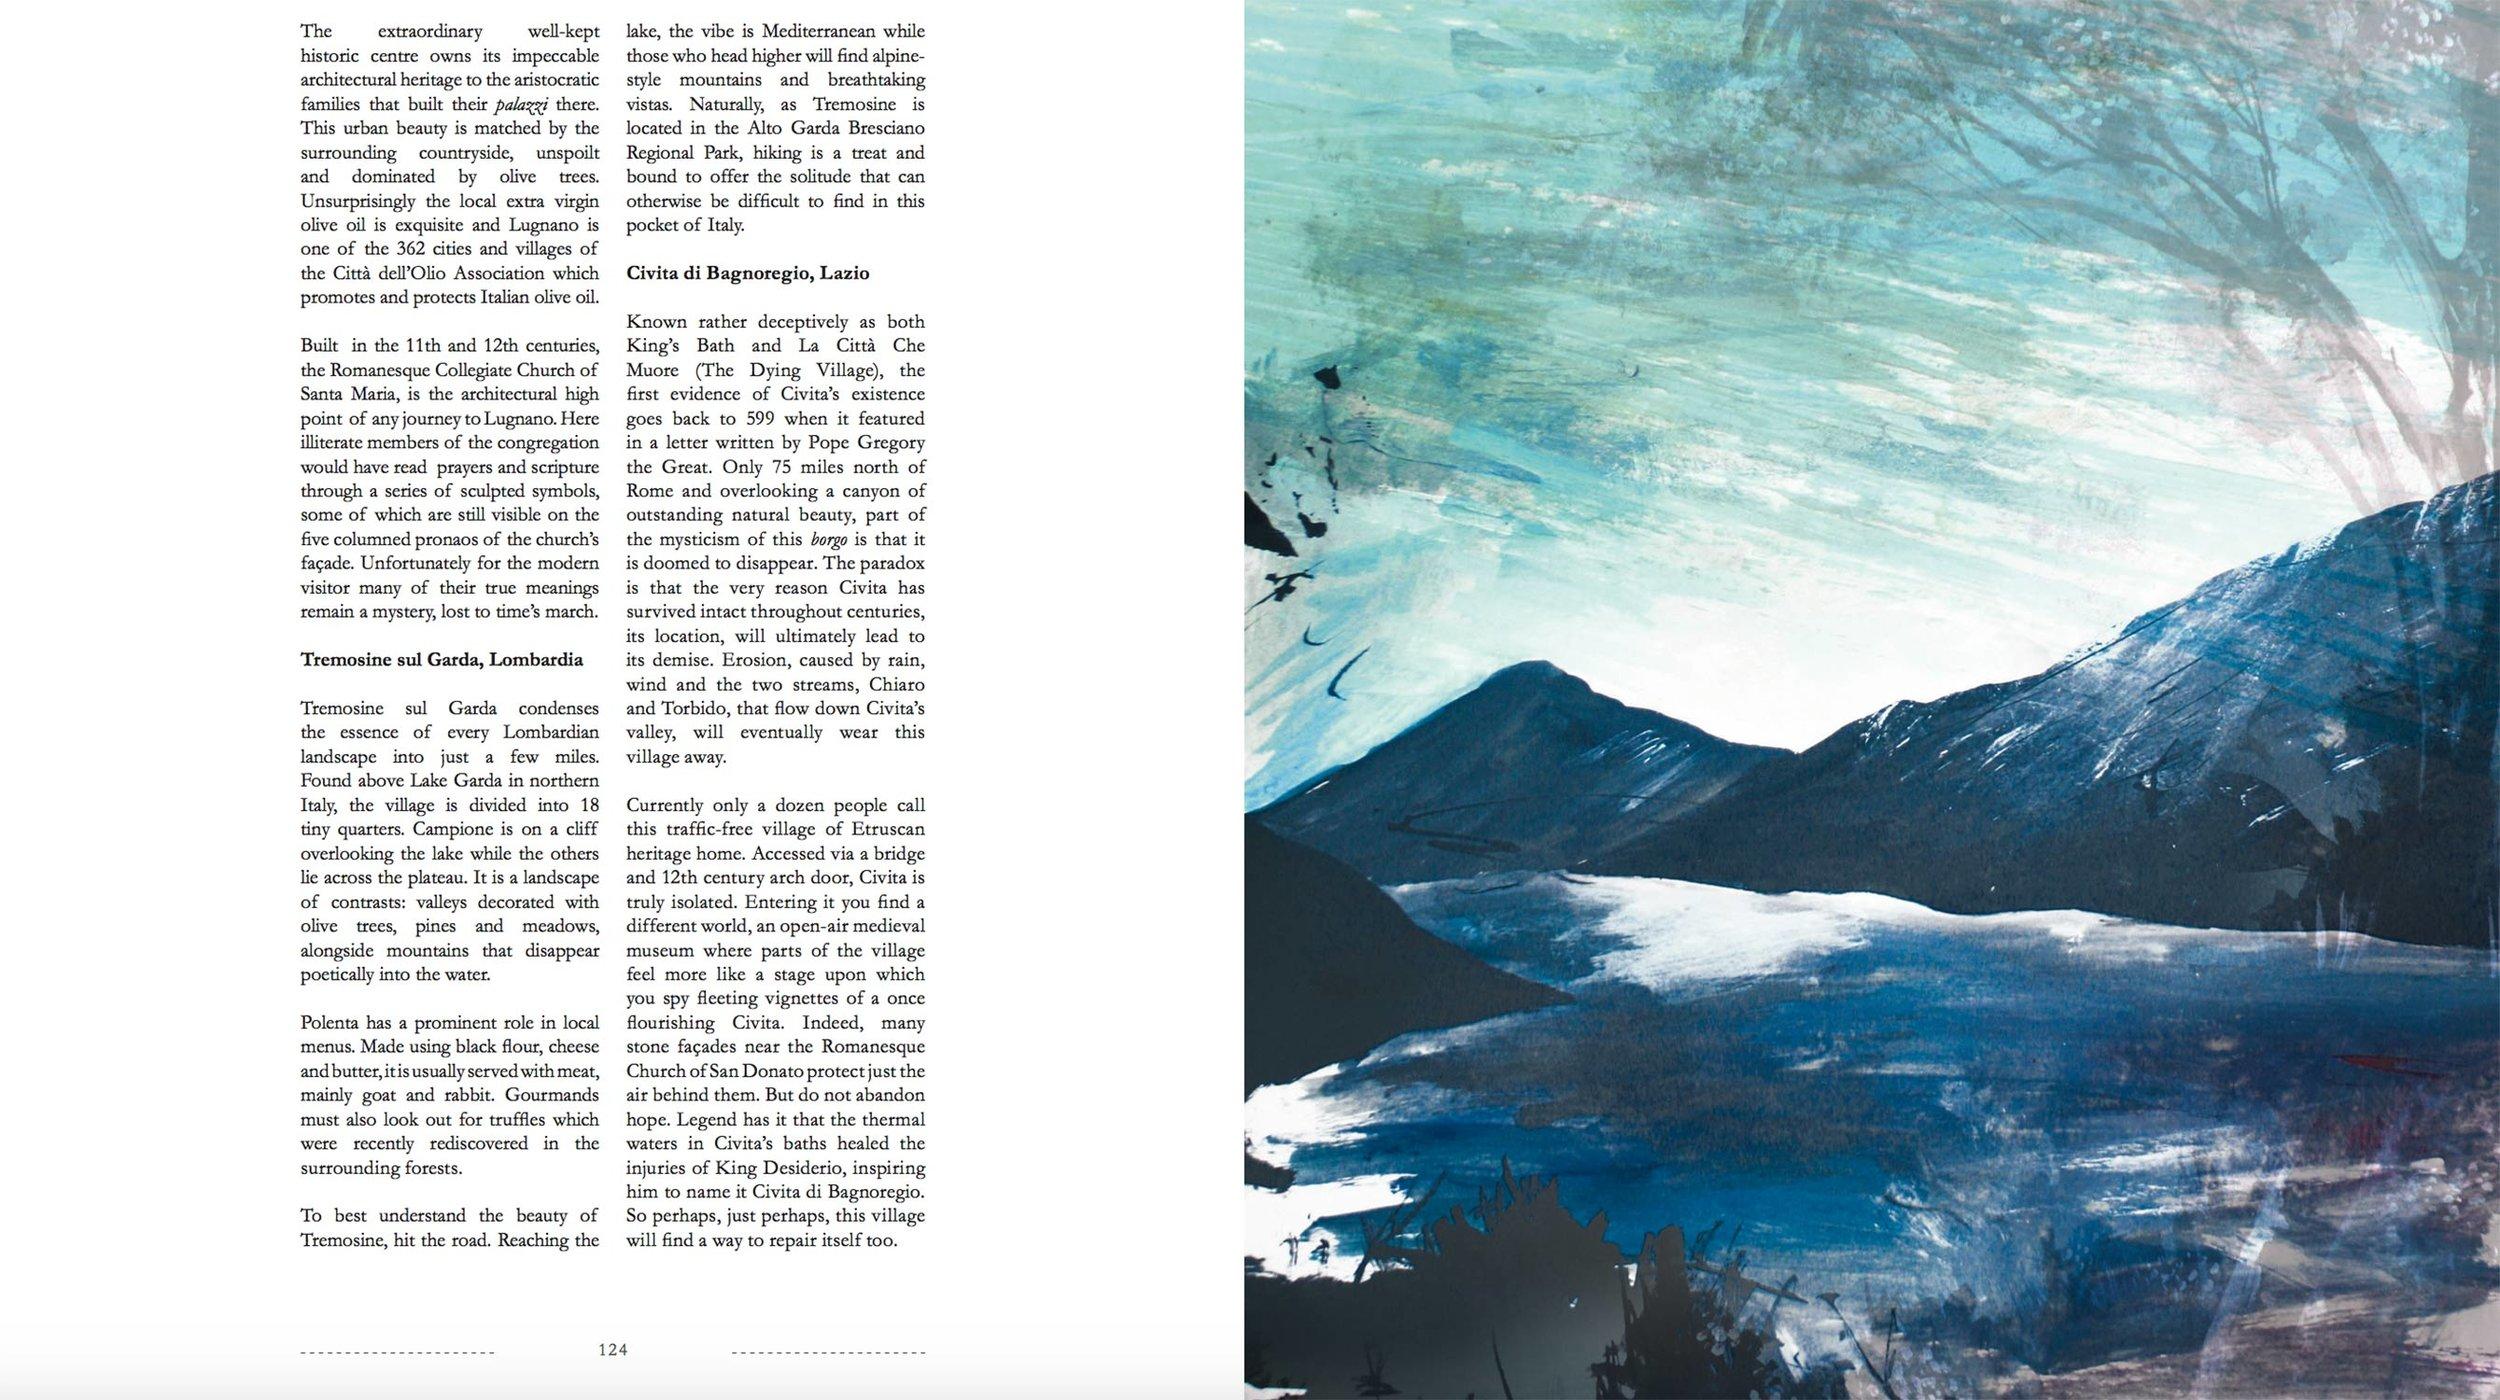 Lodestars_Anthology_Italy_Issue_3_3.jpg